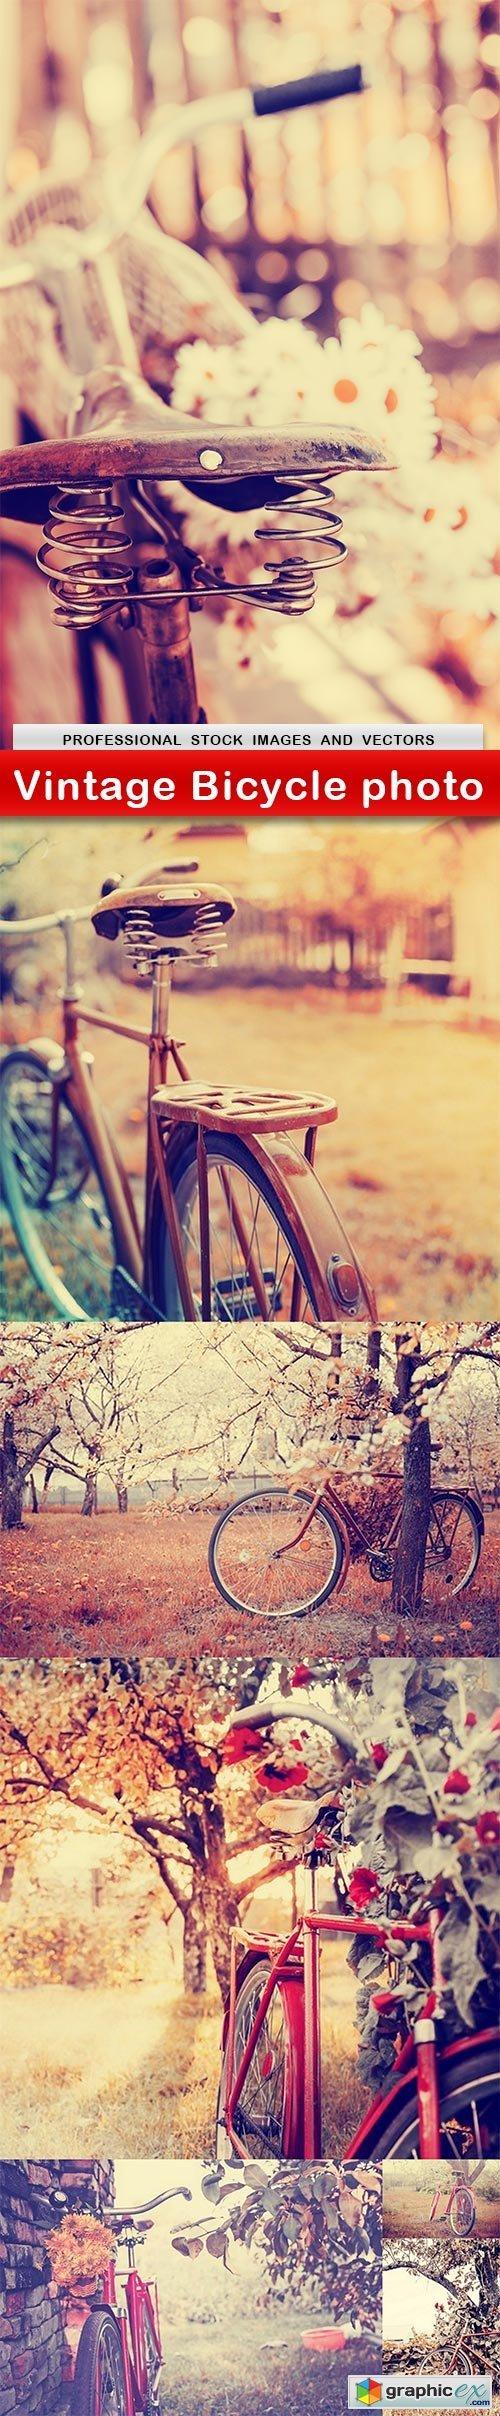 Vintage Bicycle photo - 7 UHQ JPEG